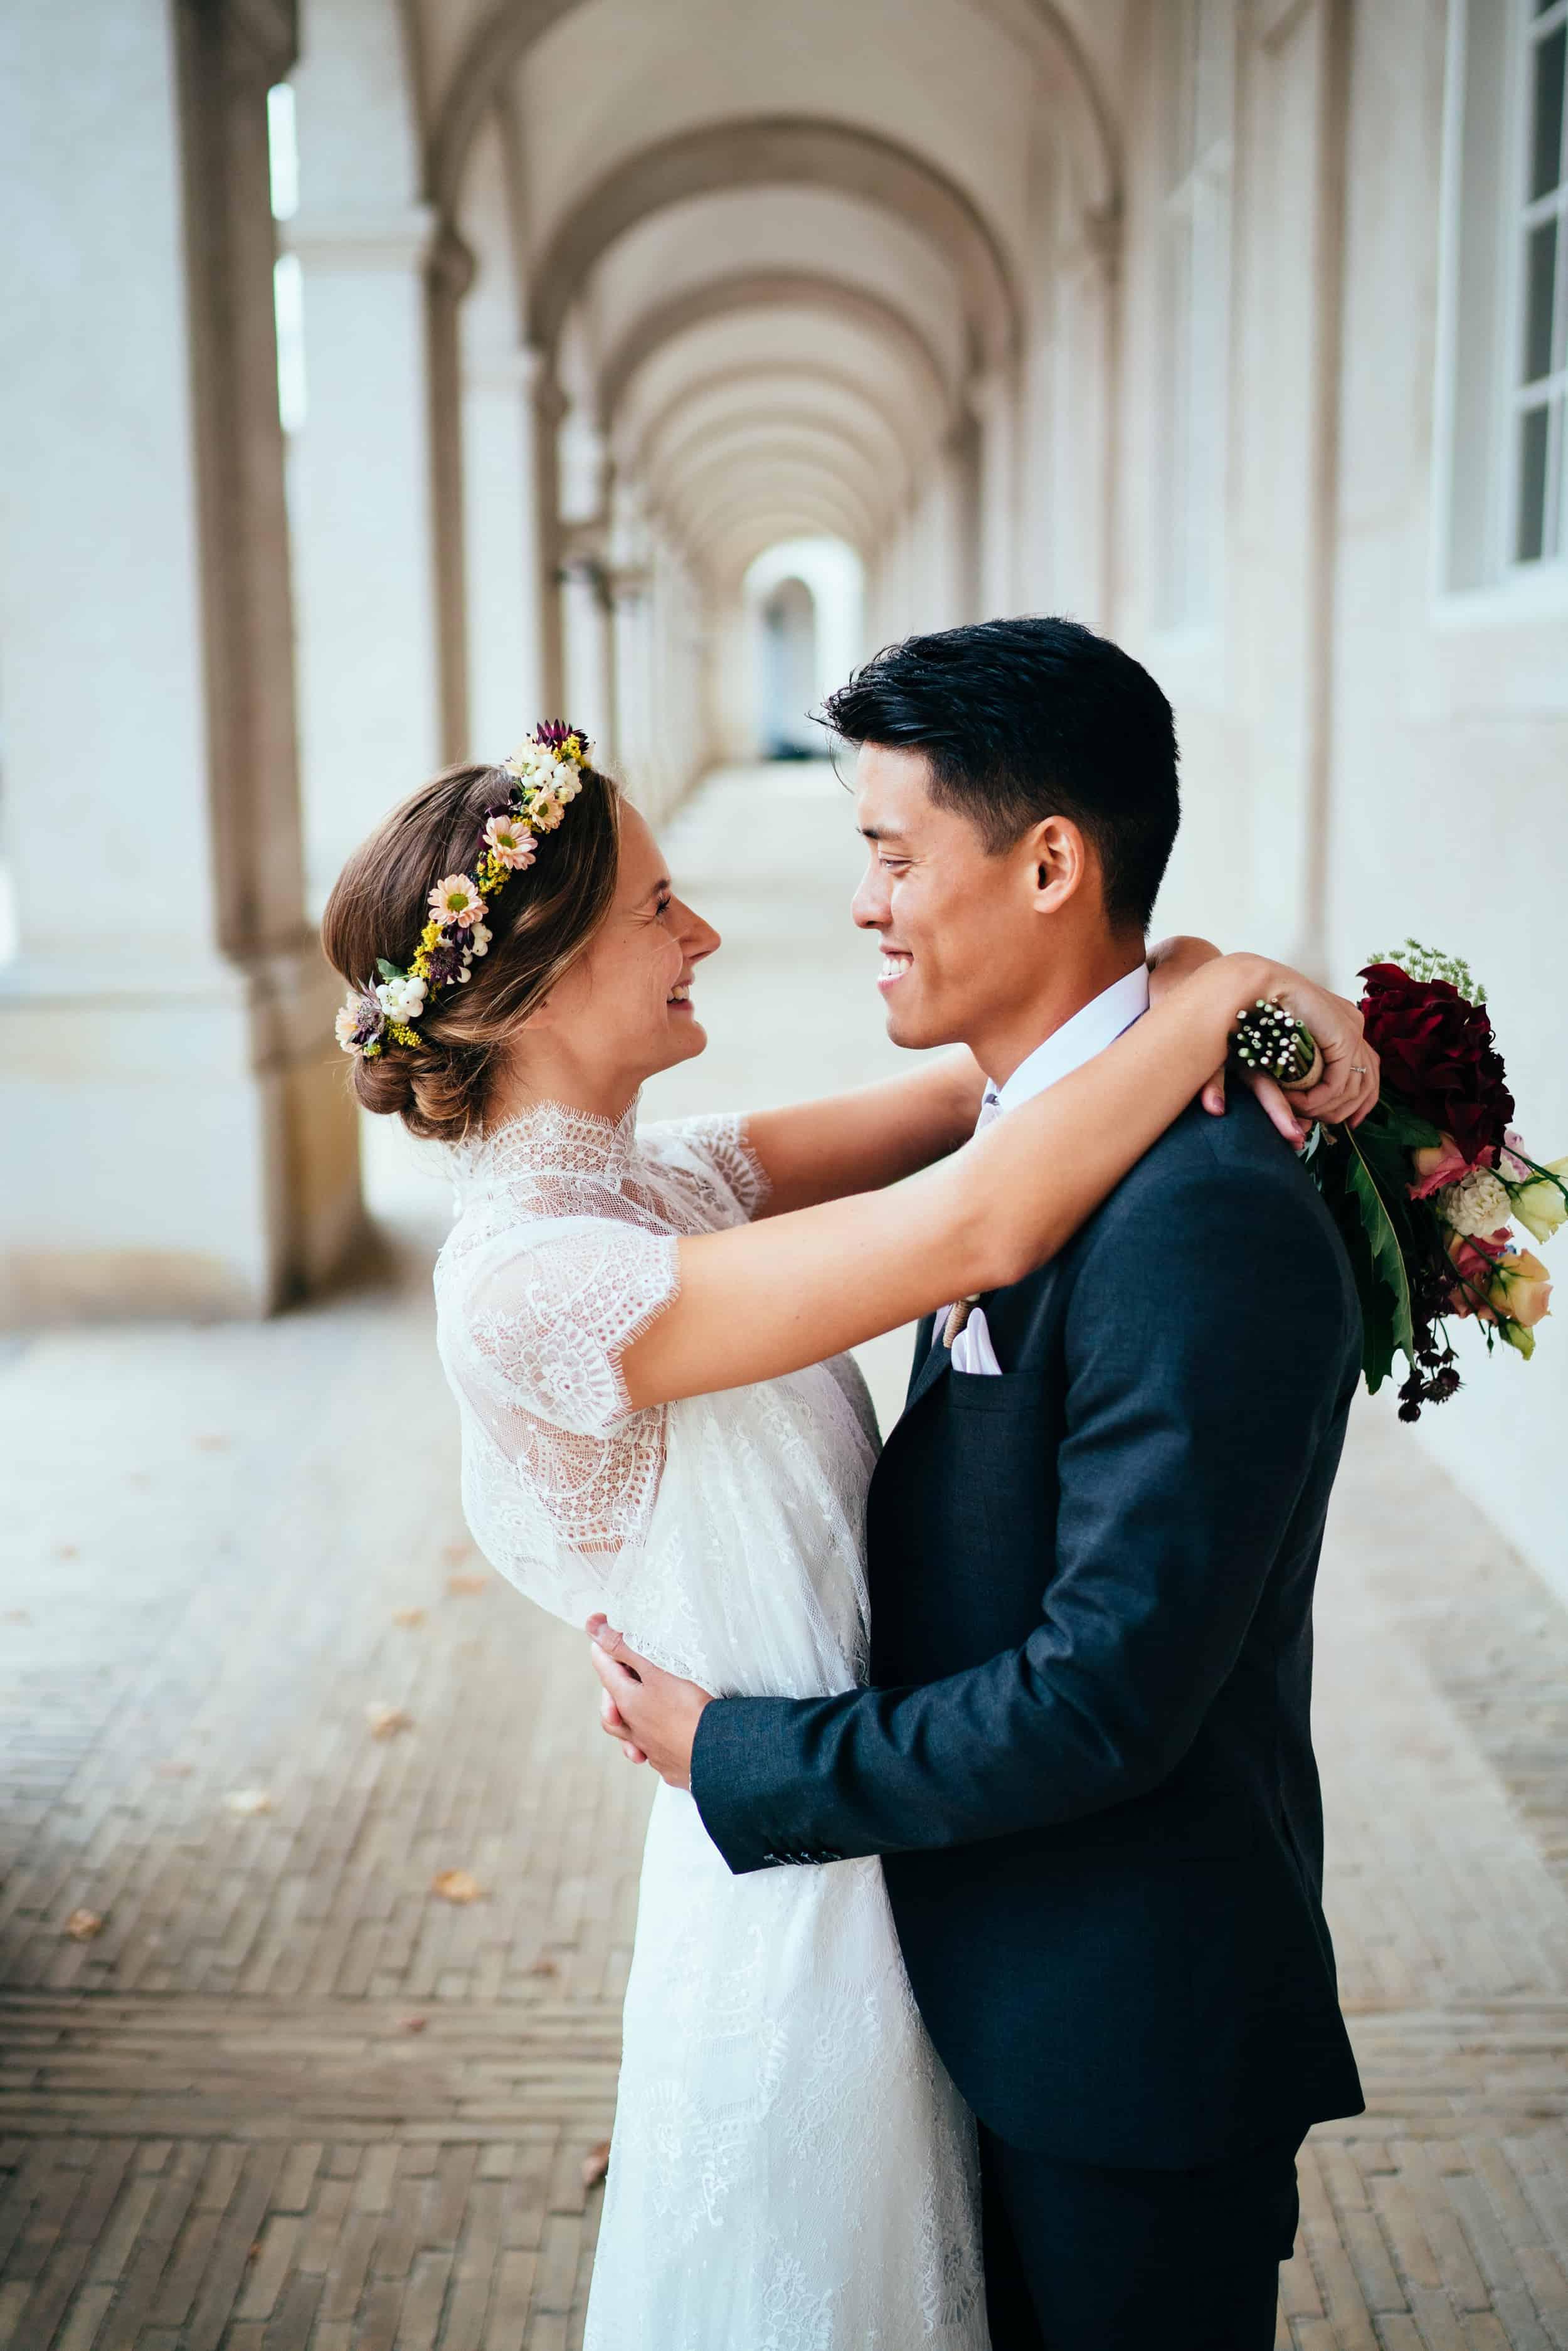 brudepar-ved-ridebanerne.jpg